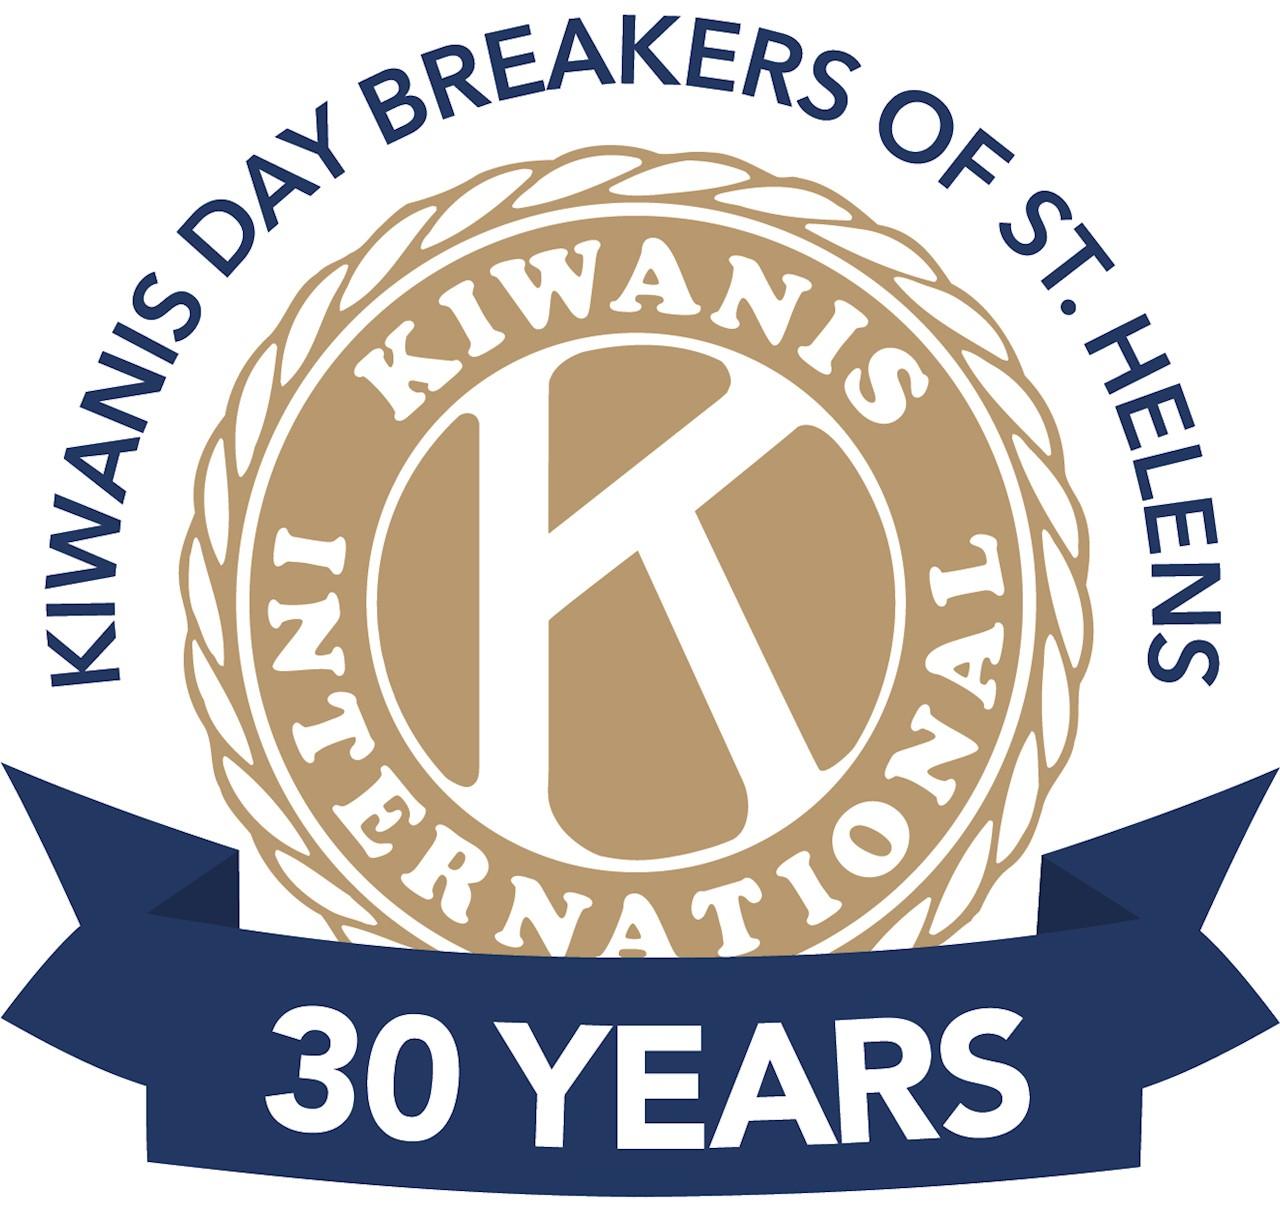 St. Helens Day Breakers – Kiwanis International Intended For St Helens School District Calendar